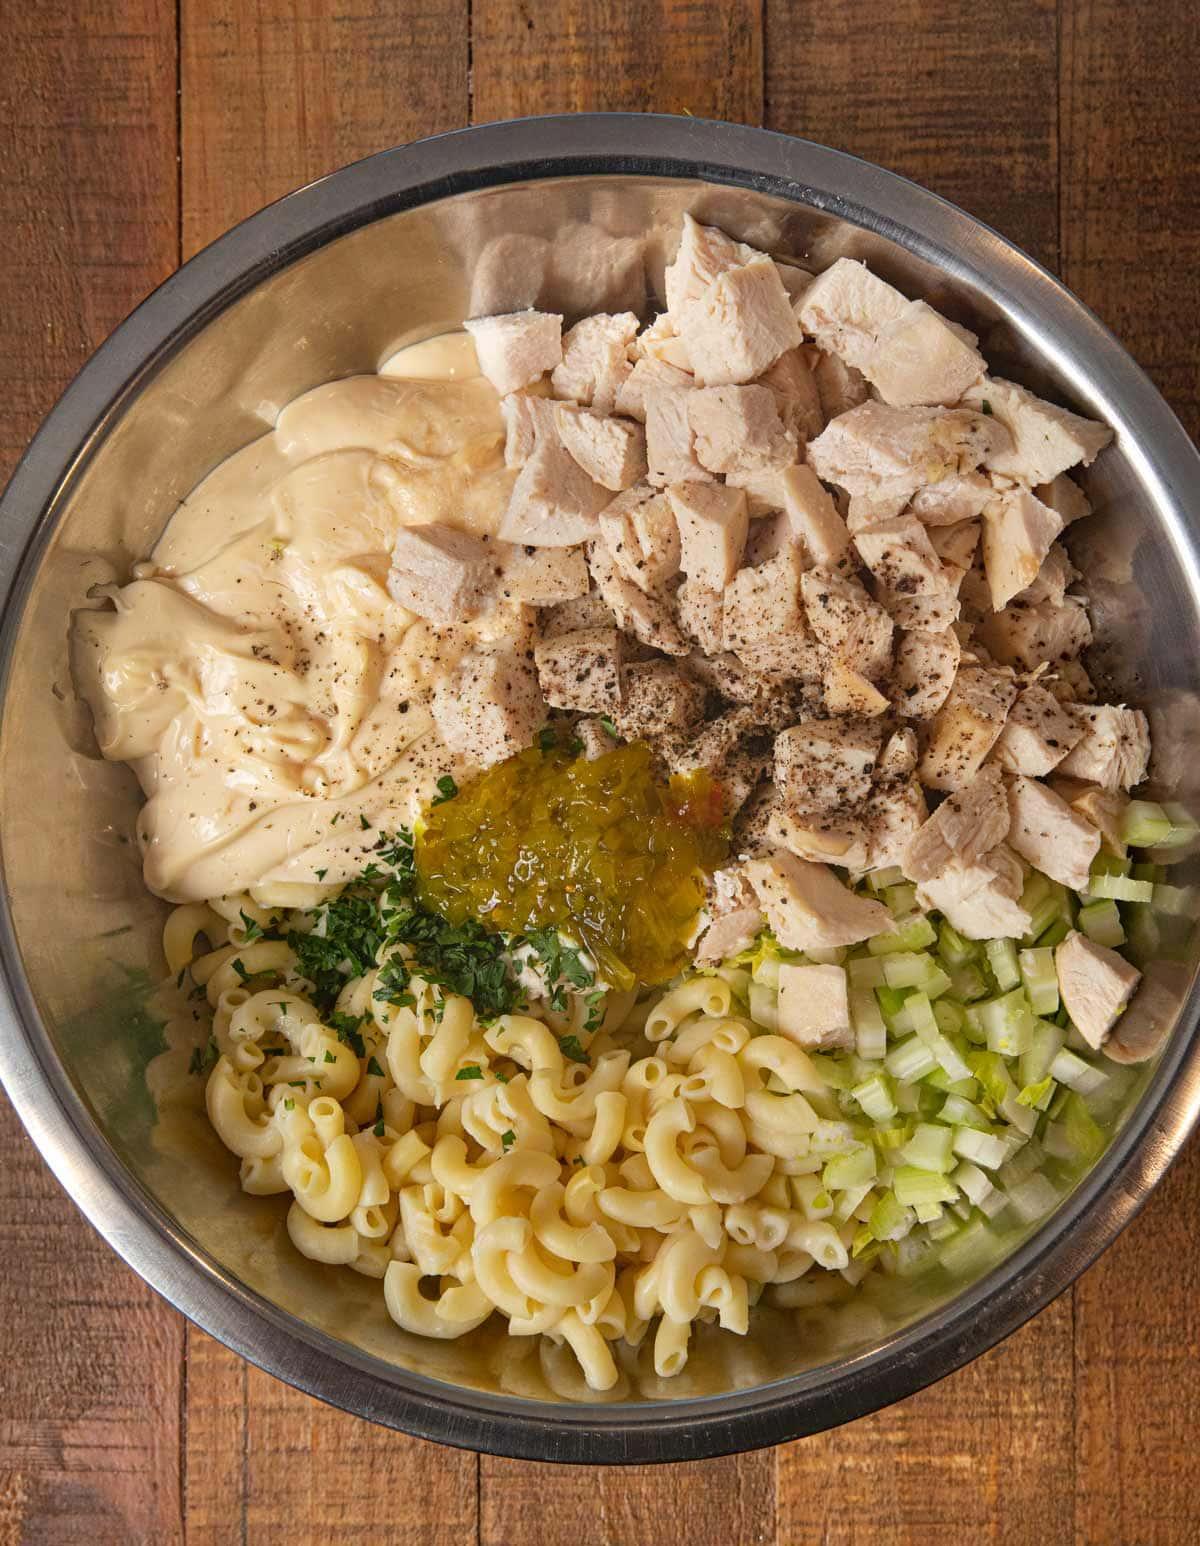 Creamy Chicken Pasta Salad ingredients in mixing bowl